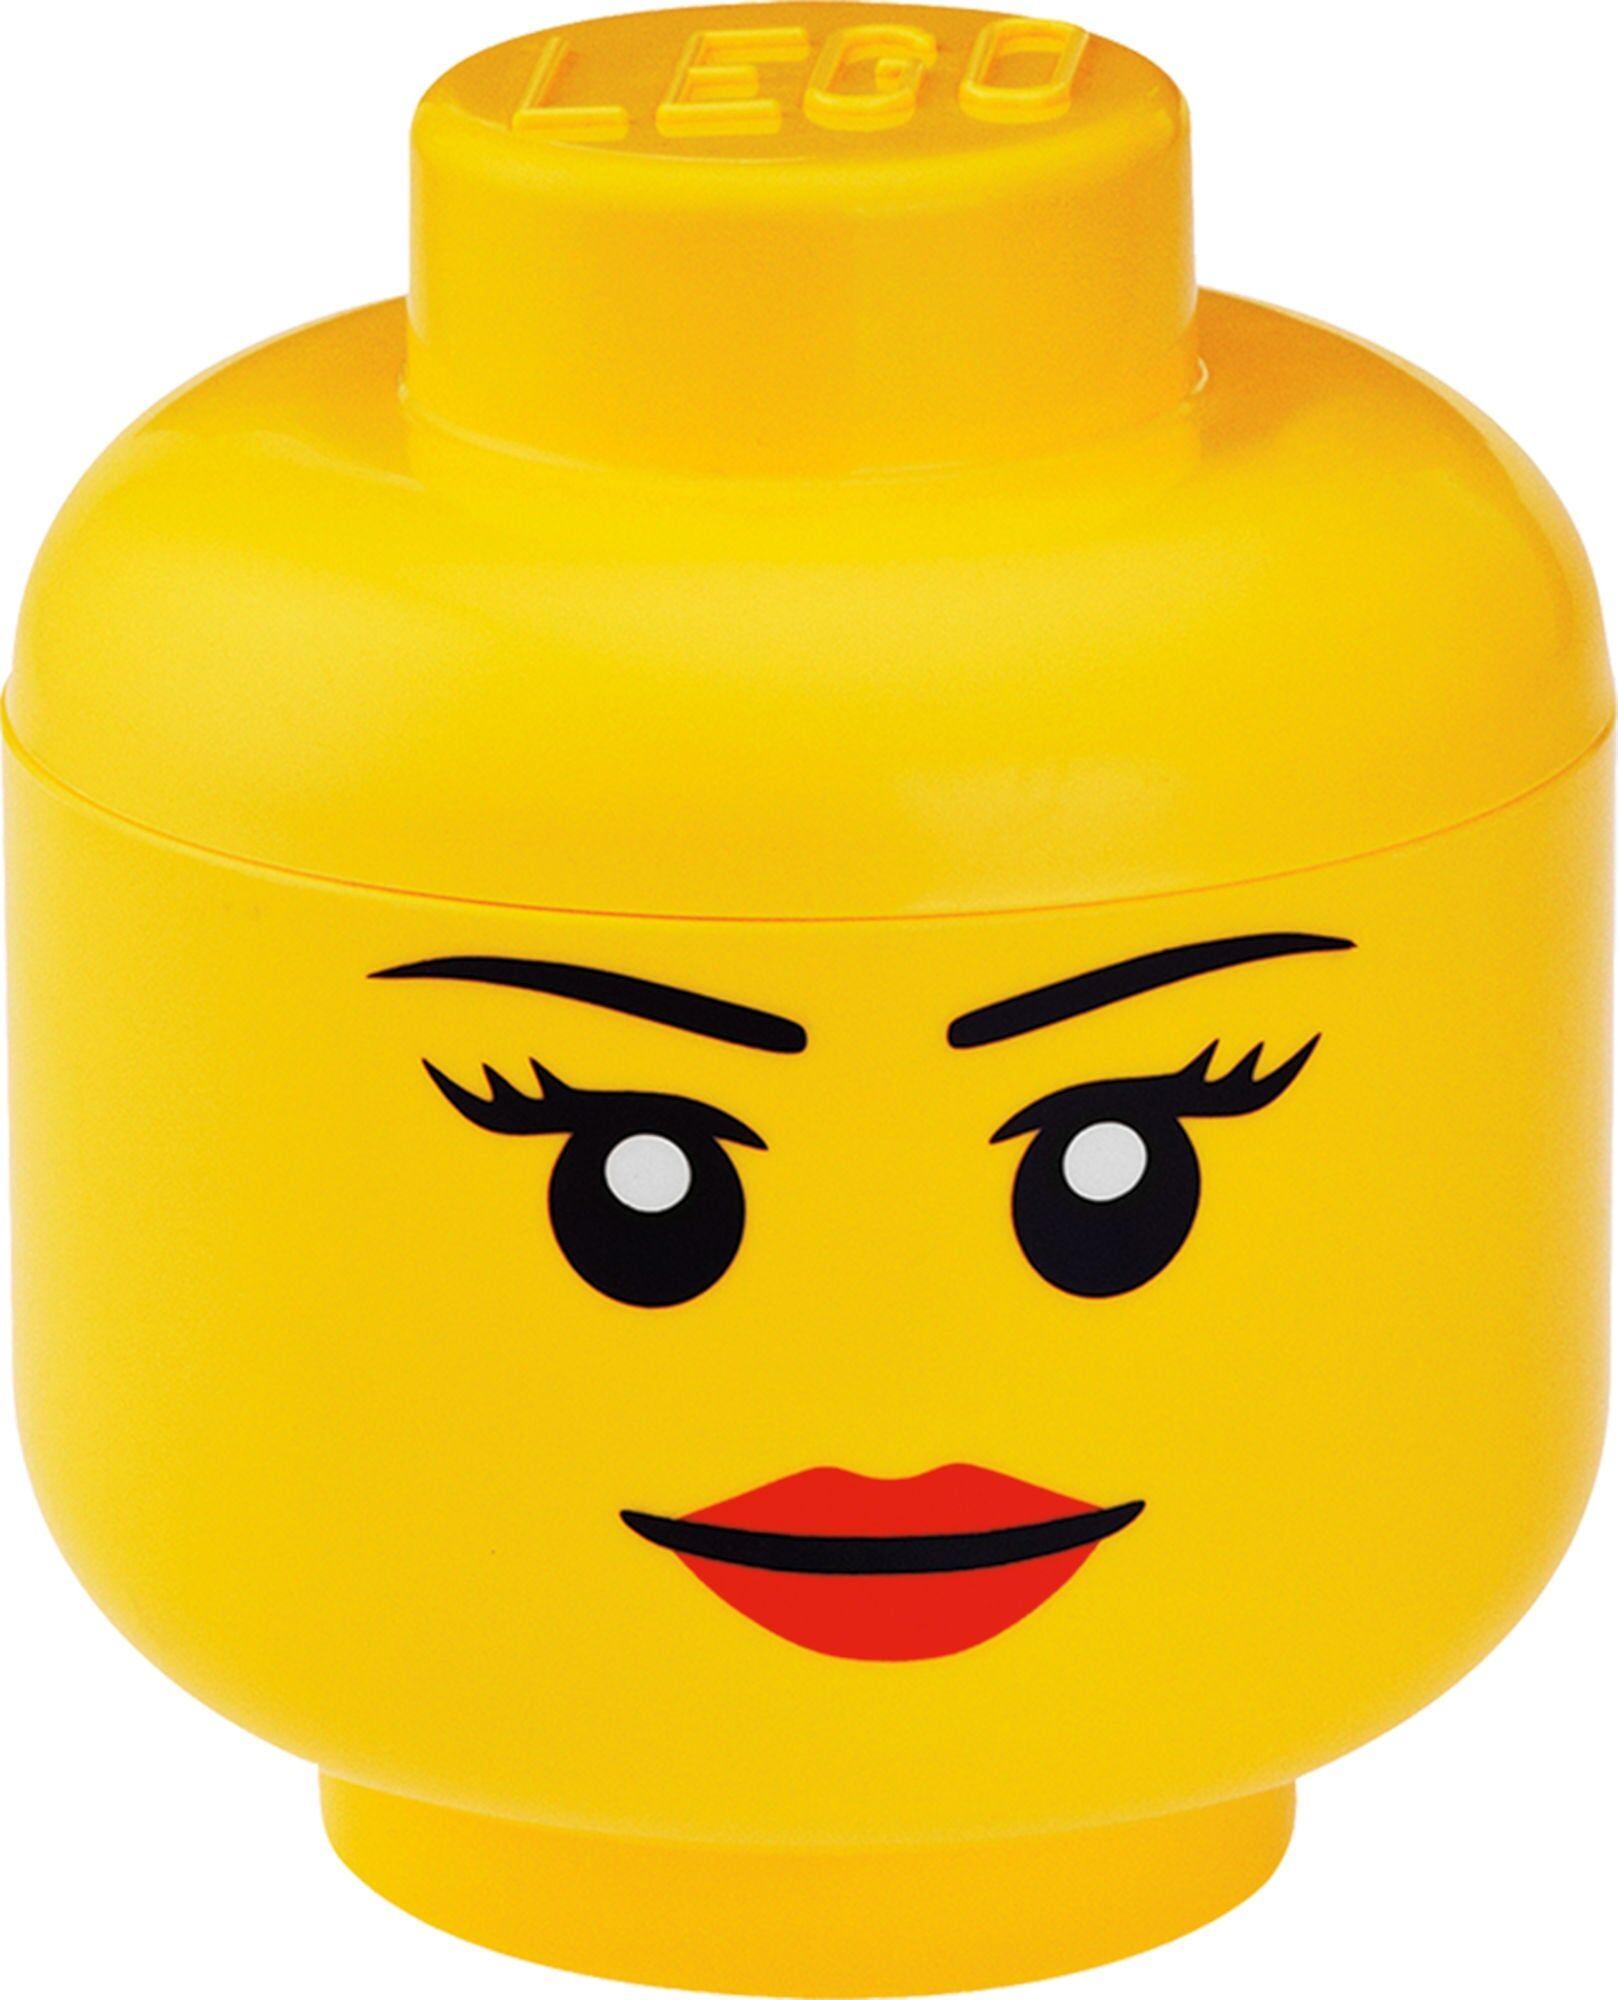 Lego Oppbevaring L Jente, Gul